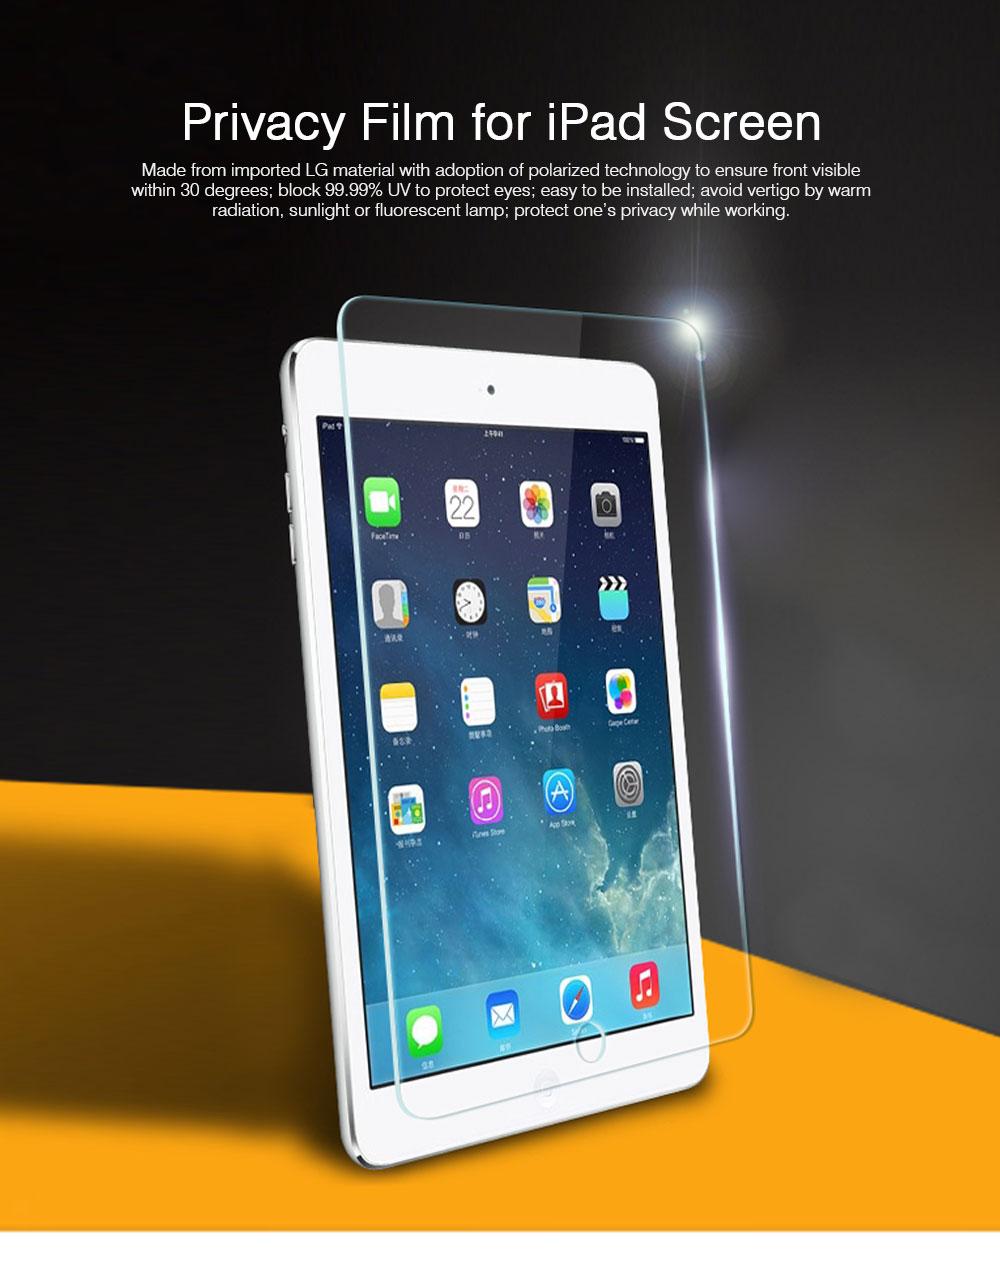 Privacy Film for iPad Screen Protective, Peep-proof Protection Film Skin Apple iPad air 2,iPad mini1 2 3,iPad2 3 4,iPad mini 4, iPad pro 9.7, Pro 12.9 10.5 0